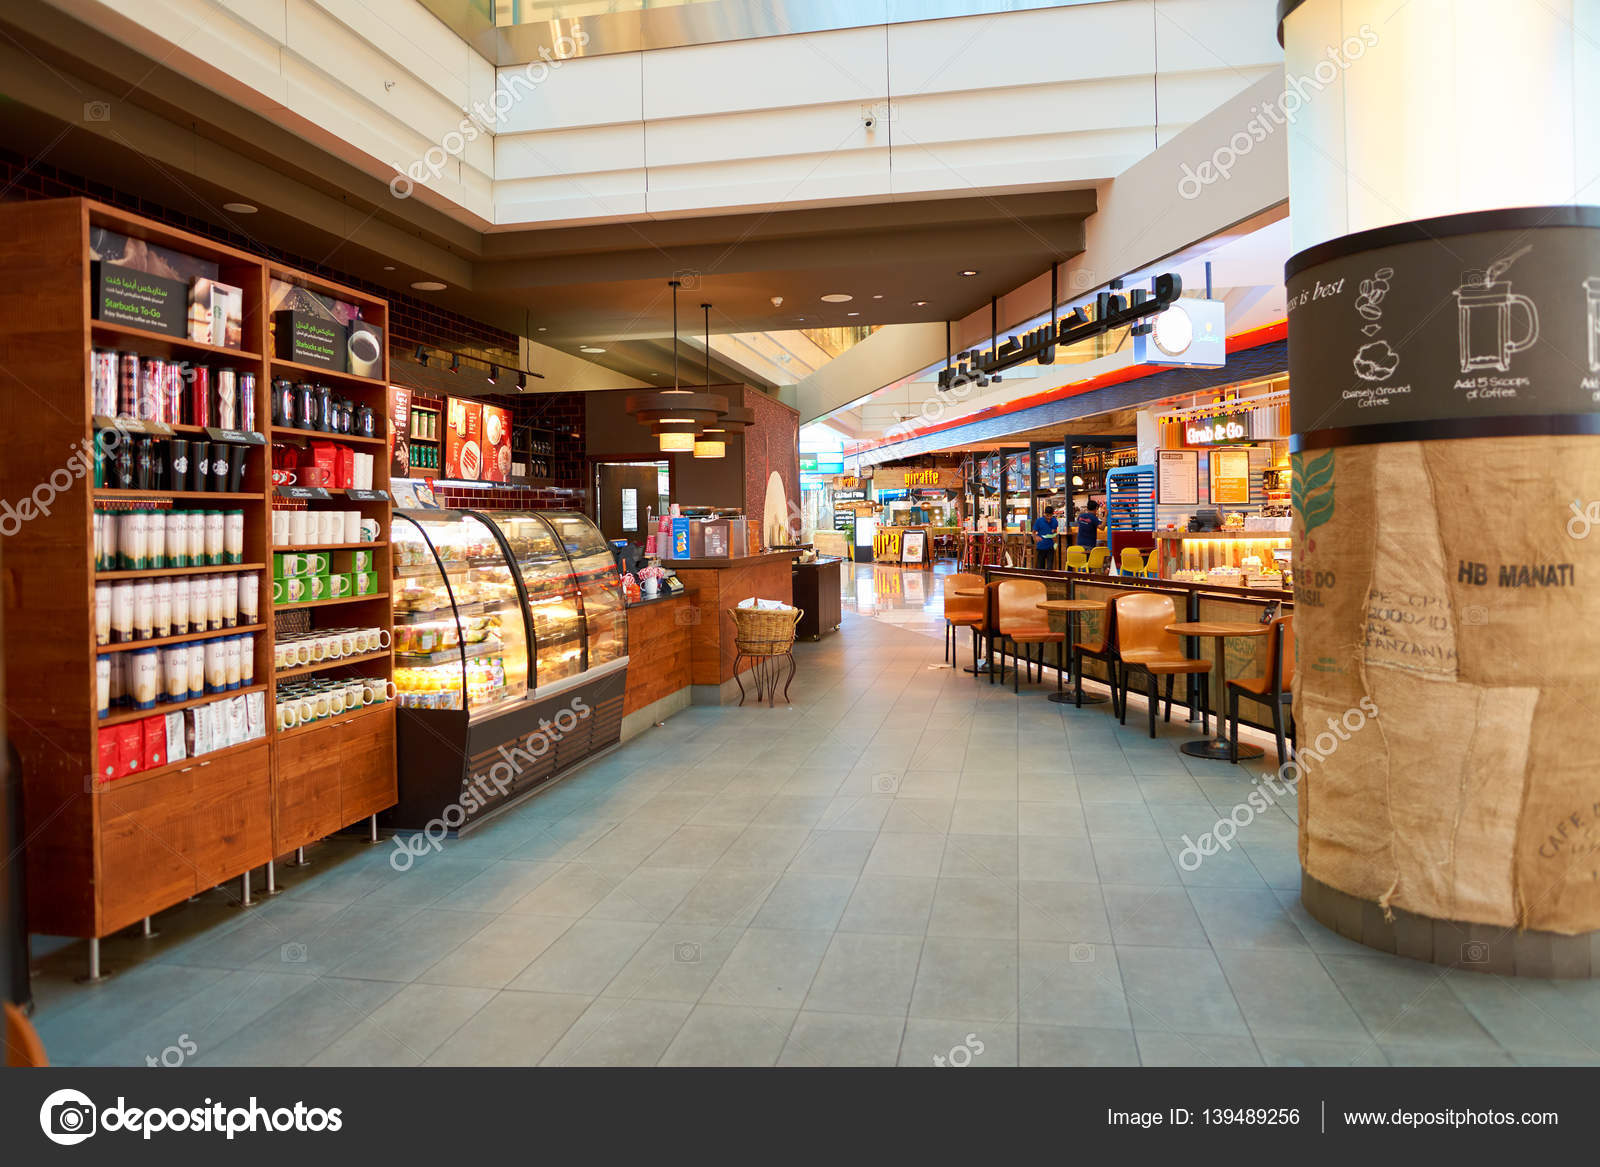 https://st3.depositphotos.com/1001279/13948/i/1600/depositphotos_139489256-stockafbeelding-starbucks-cafe-interieur.jpg